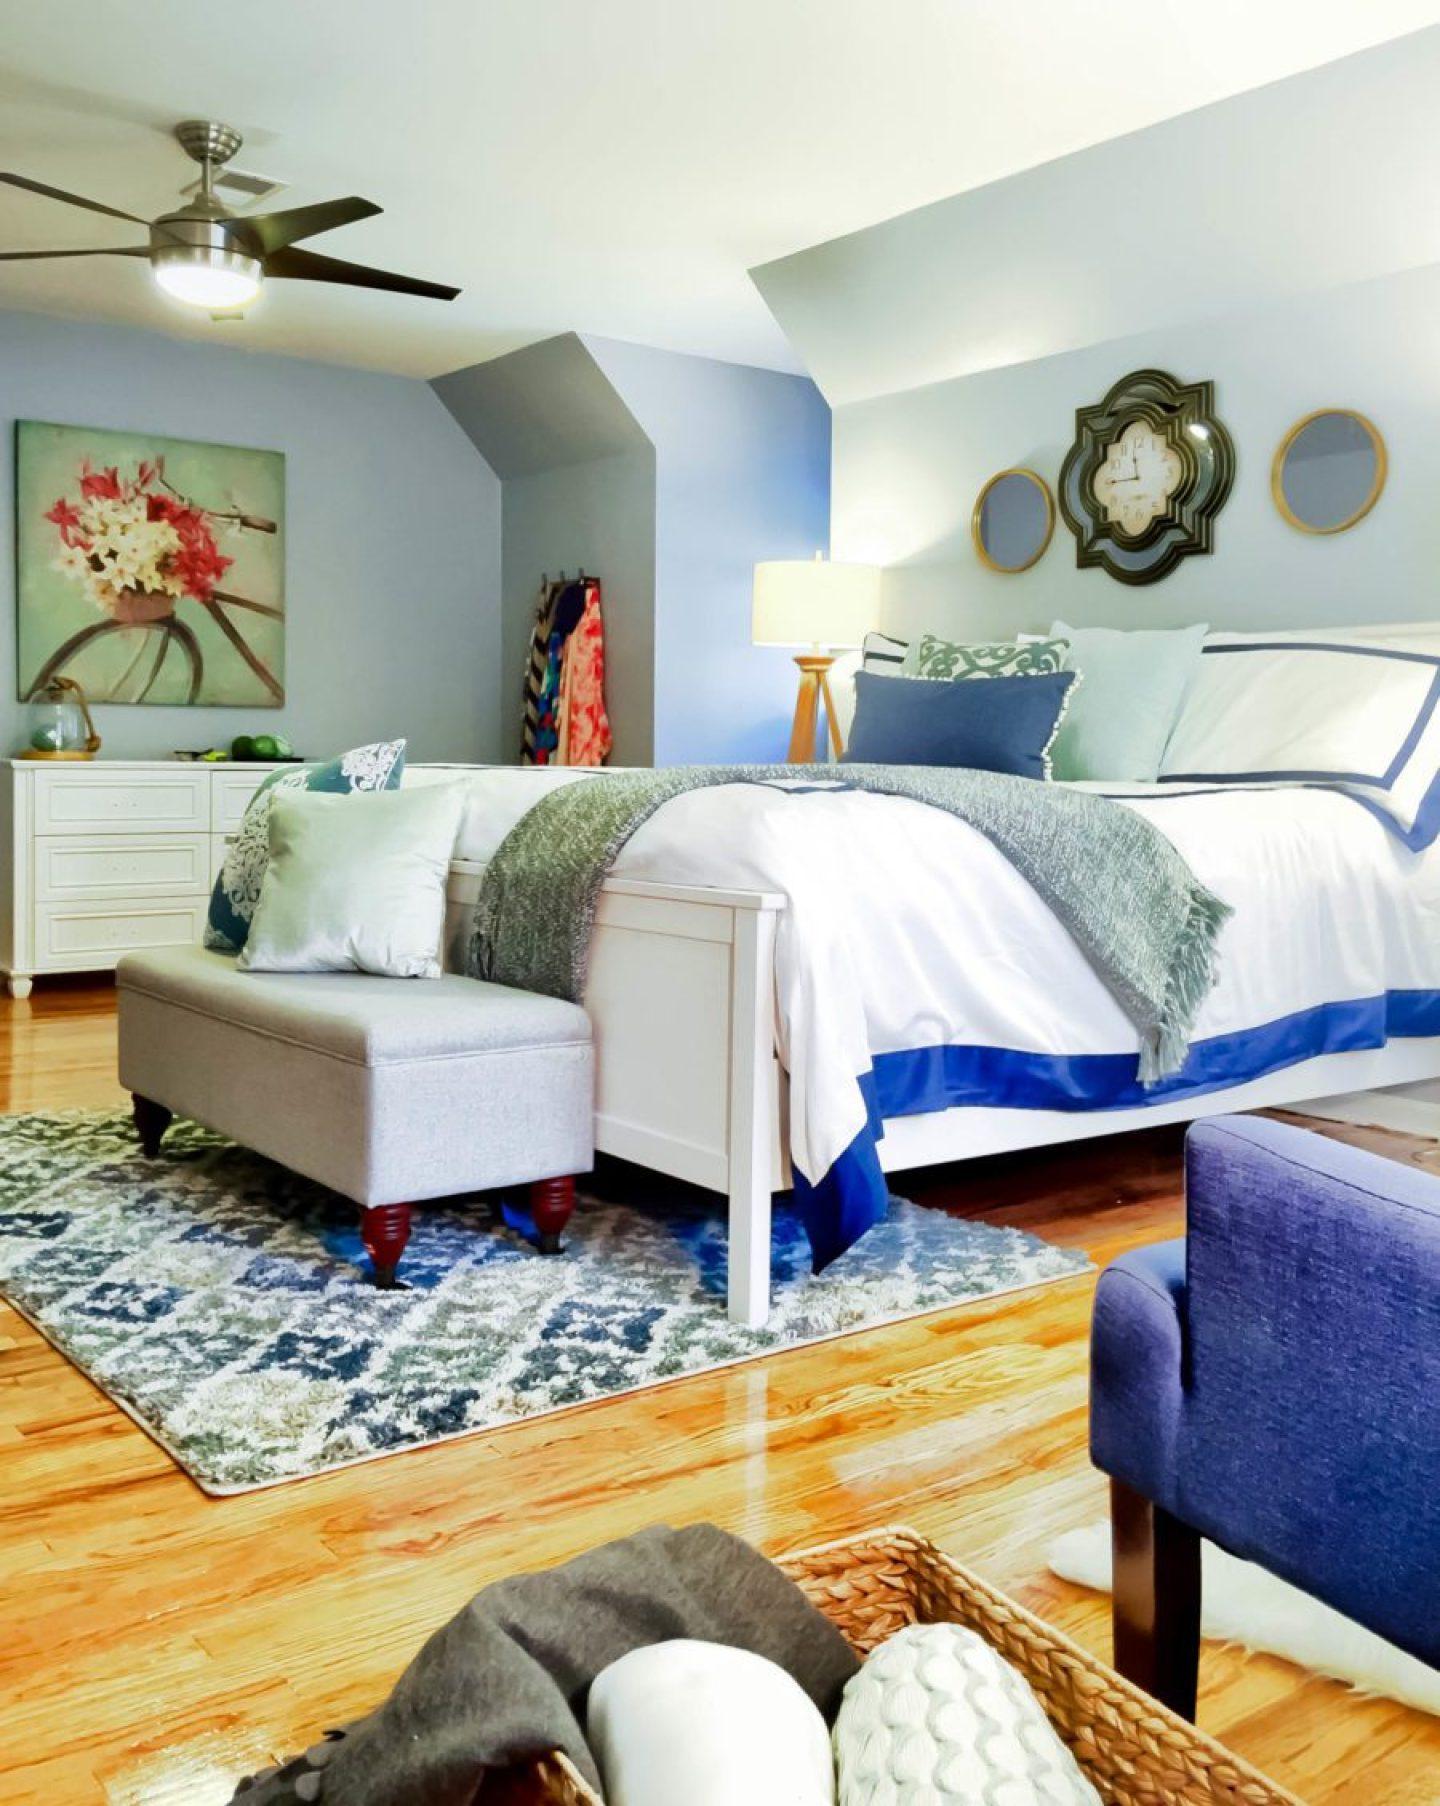 FullSizeRender-2 Designing on a Dime : Before and After Master Bedroom Tour